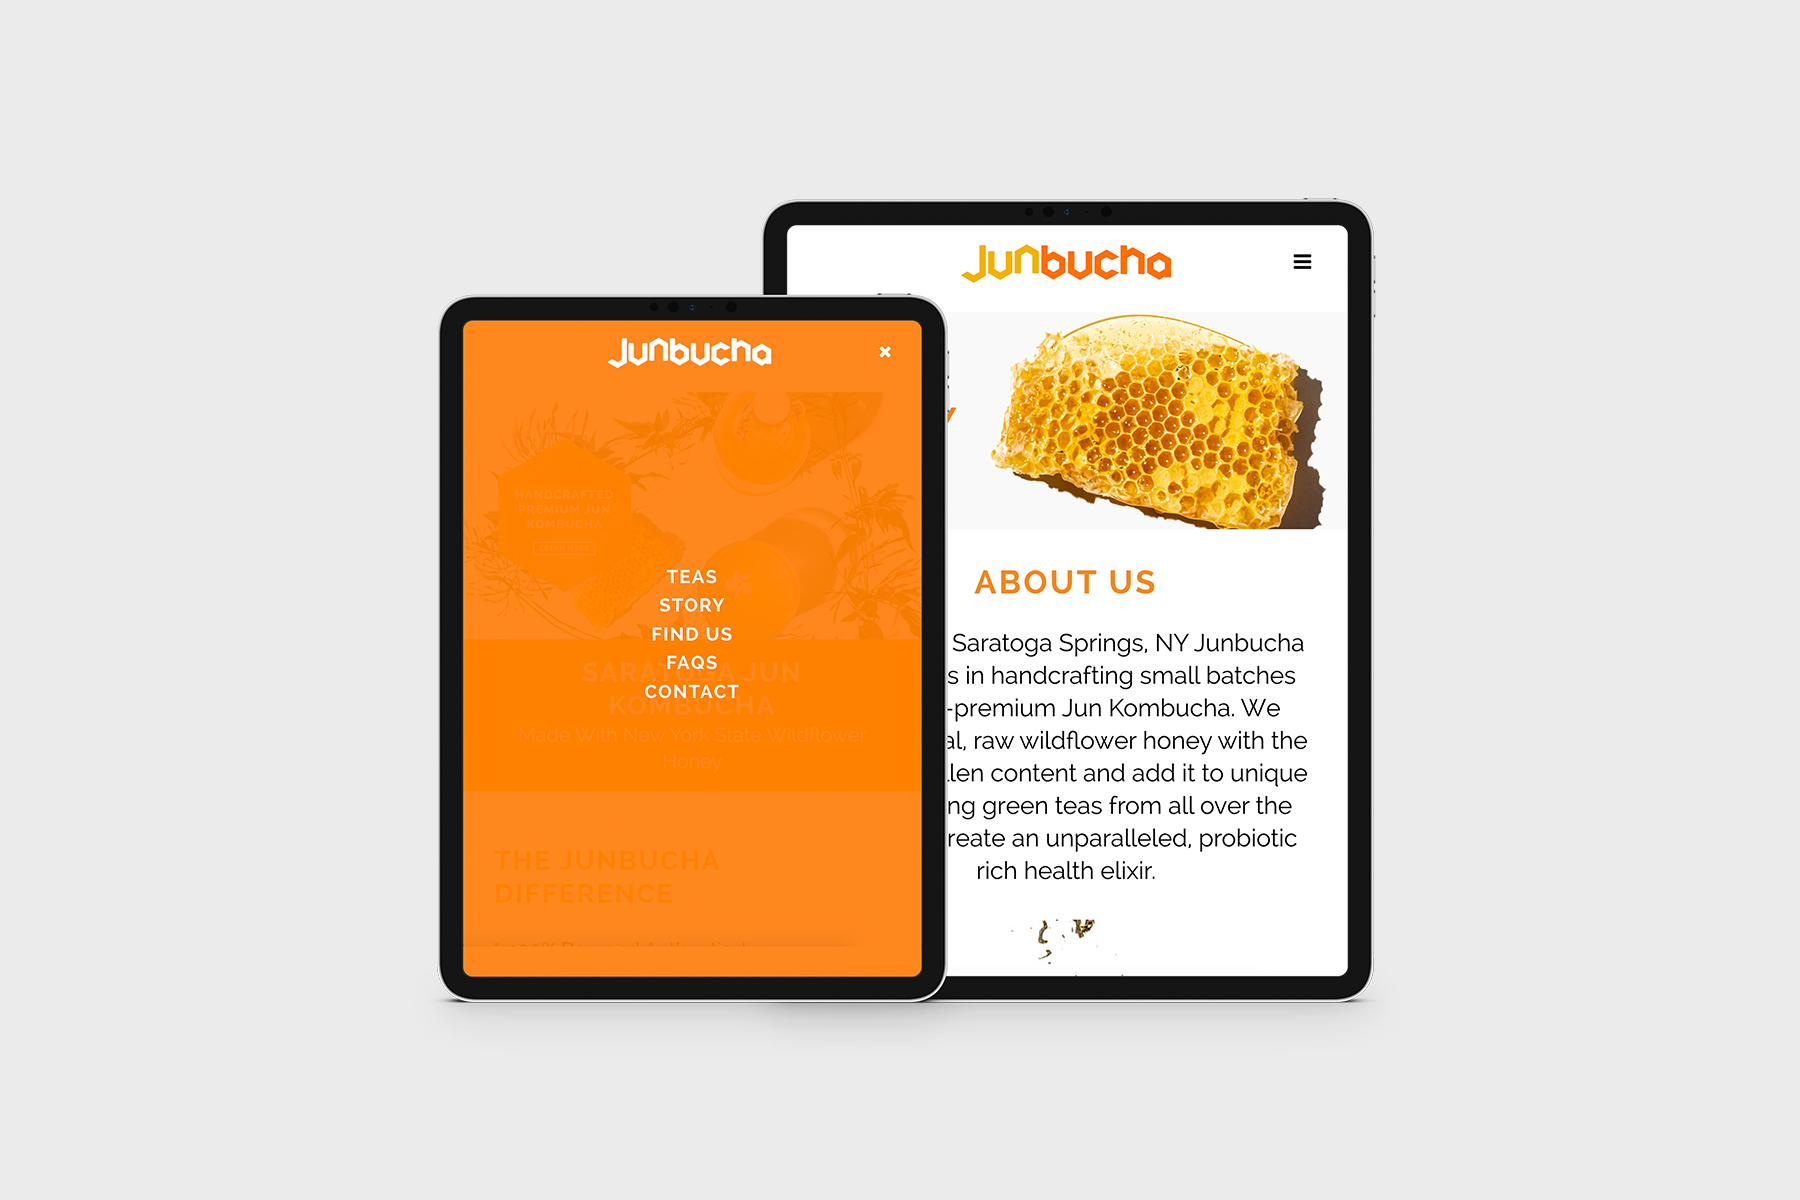 Website design on iPads